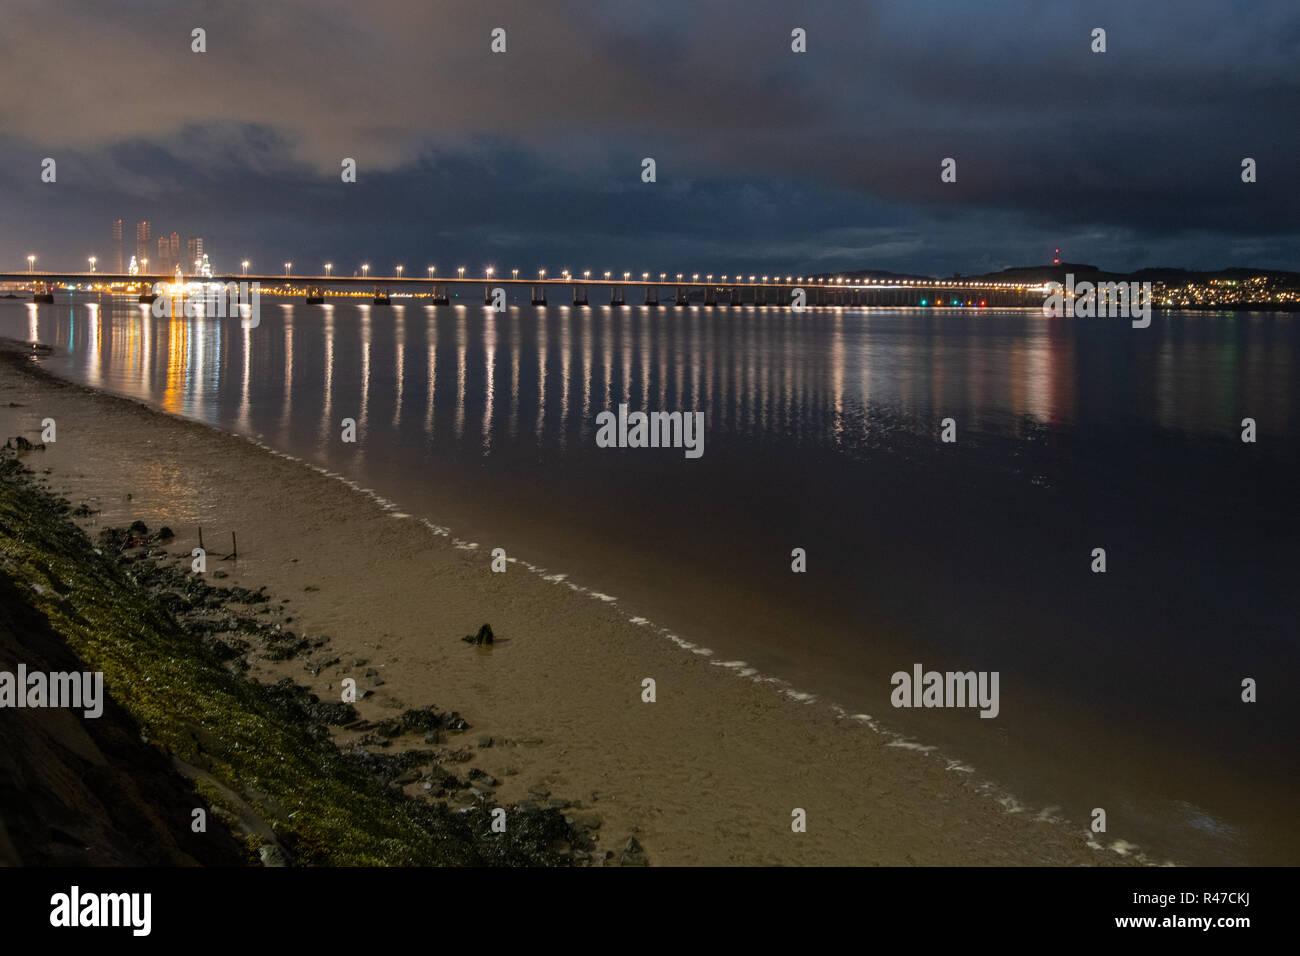 Tay Road Bridge, Dundee, at night - Stock Image